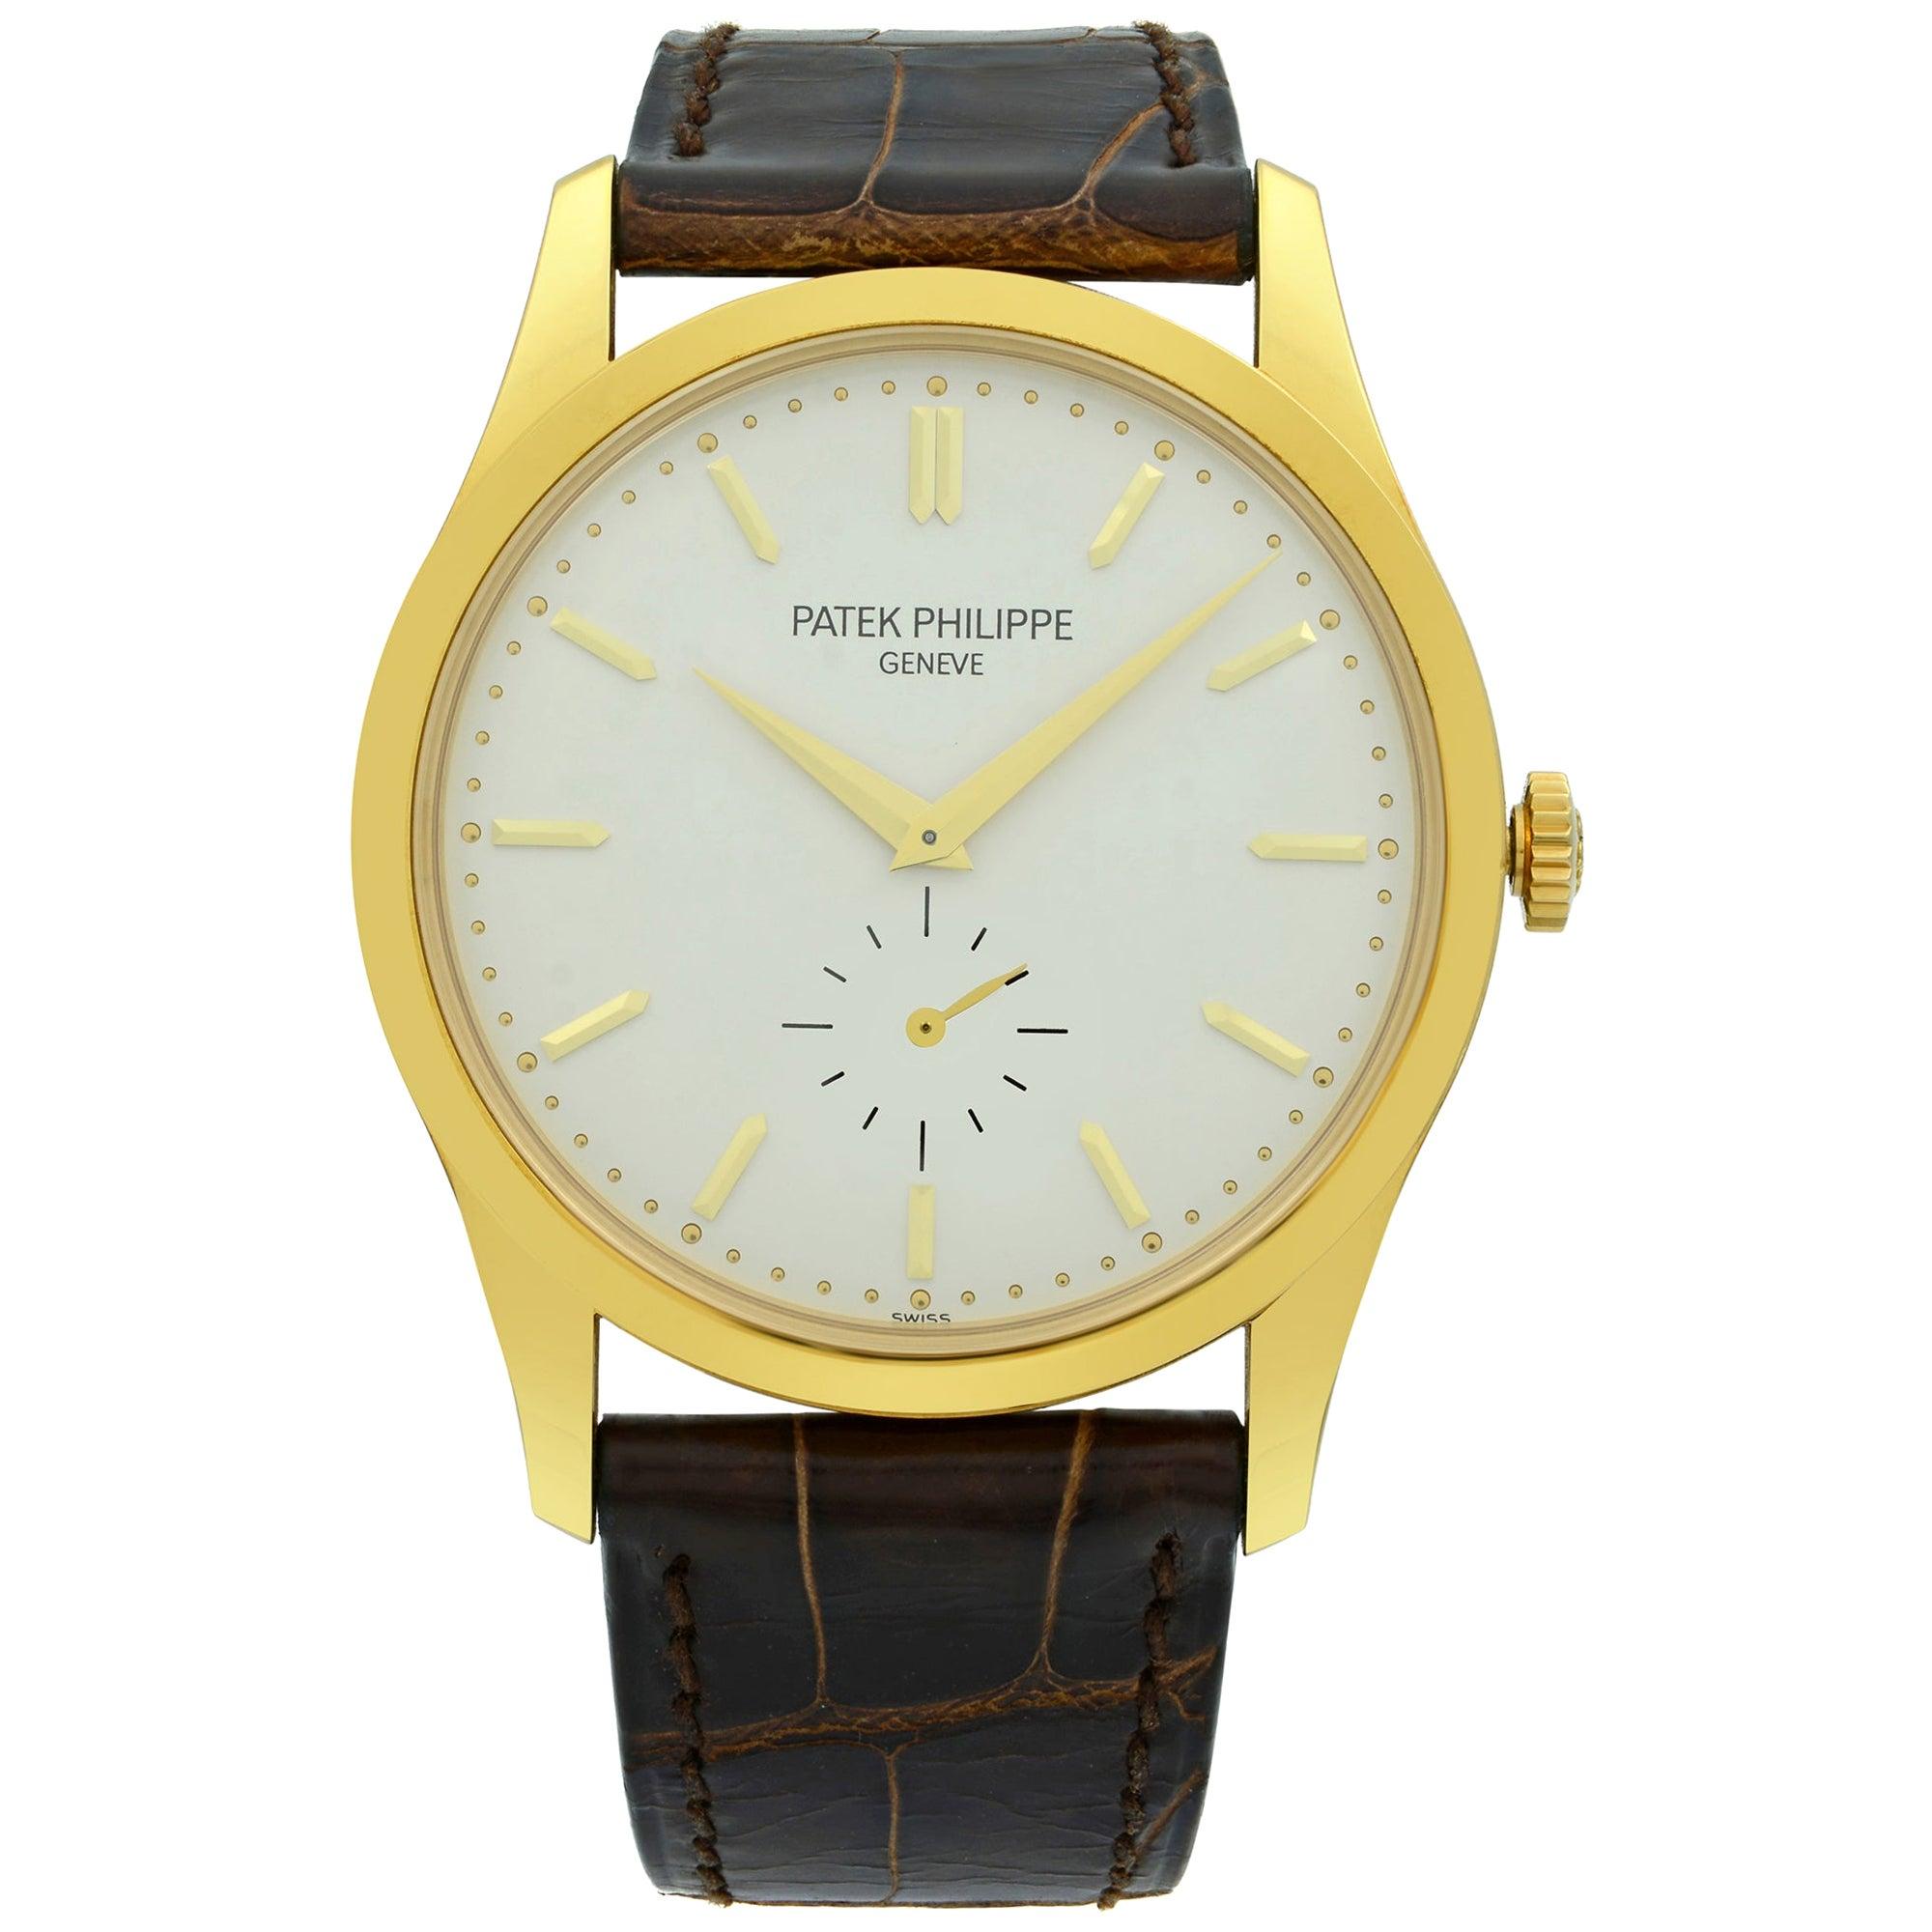 Patek Philippe Calatrava 18K Gold Silver Dial Hand-Wind Men's Watch 5196J-001